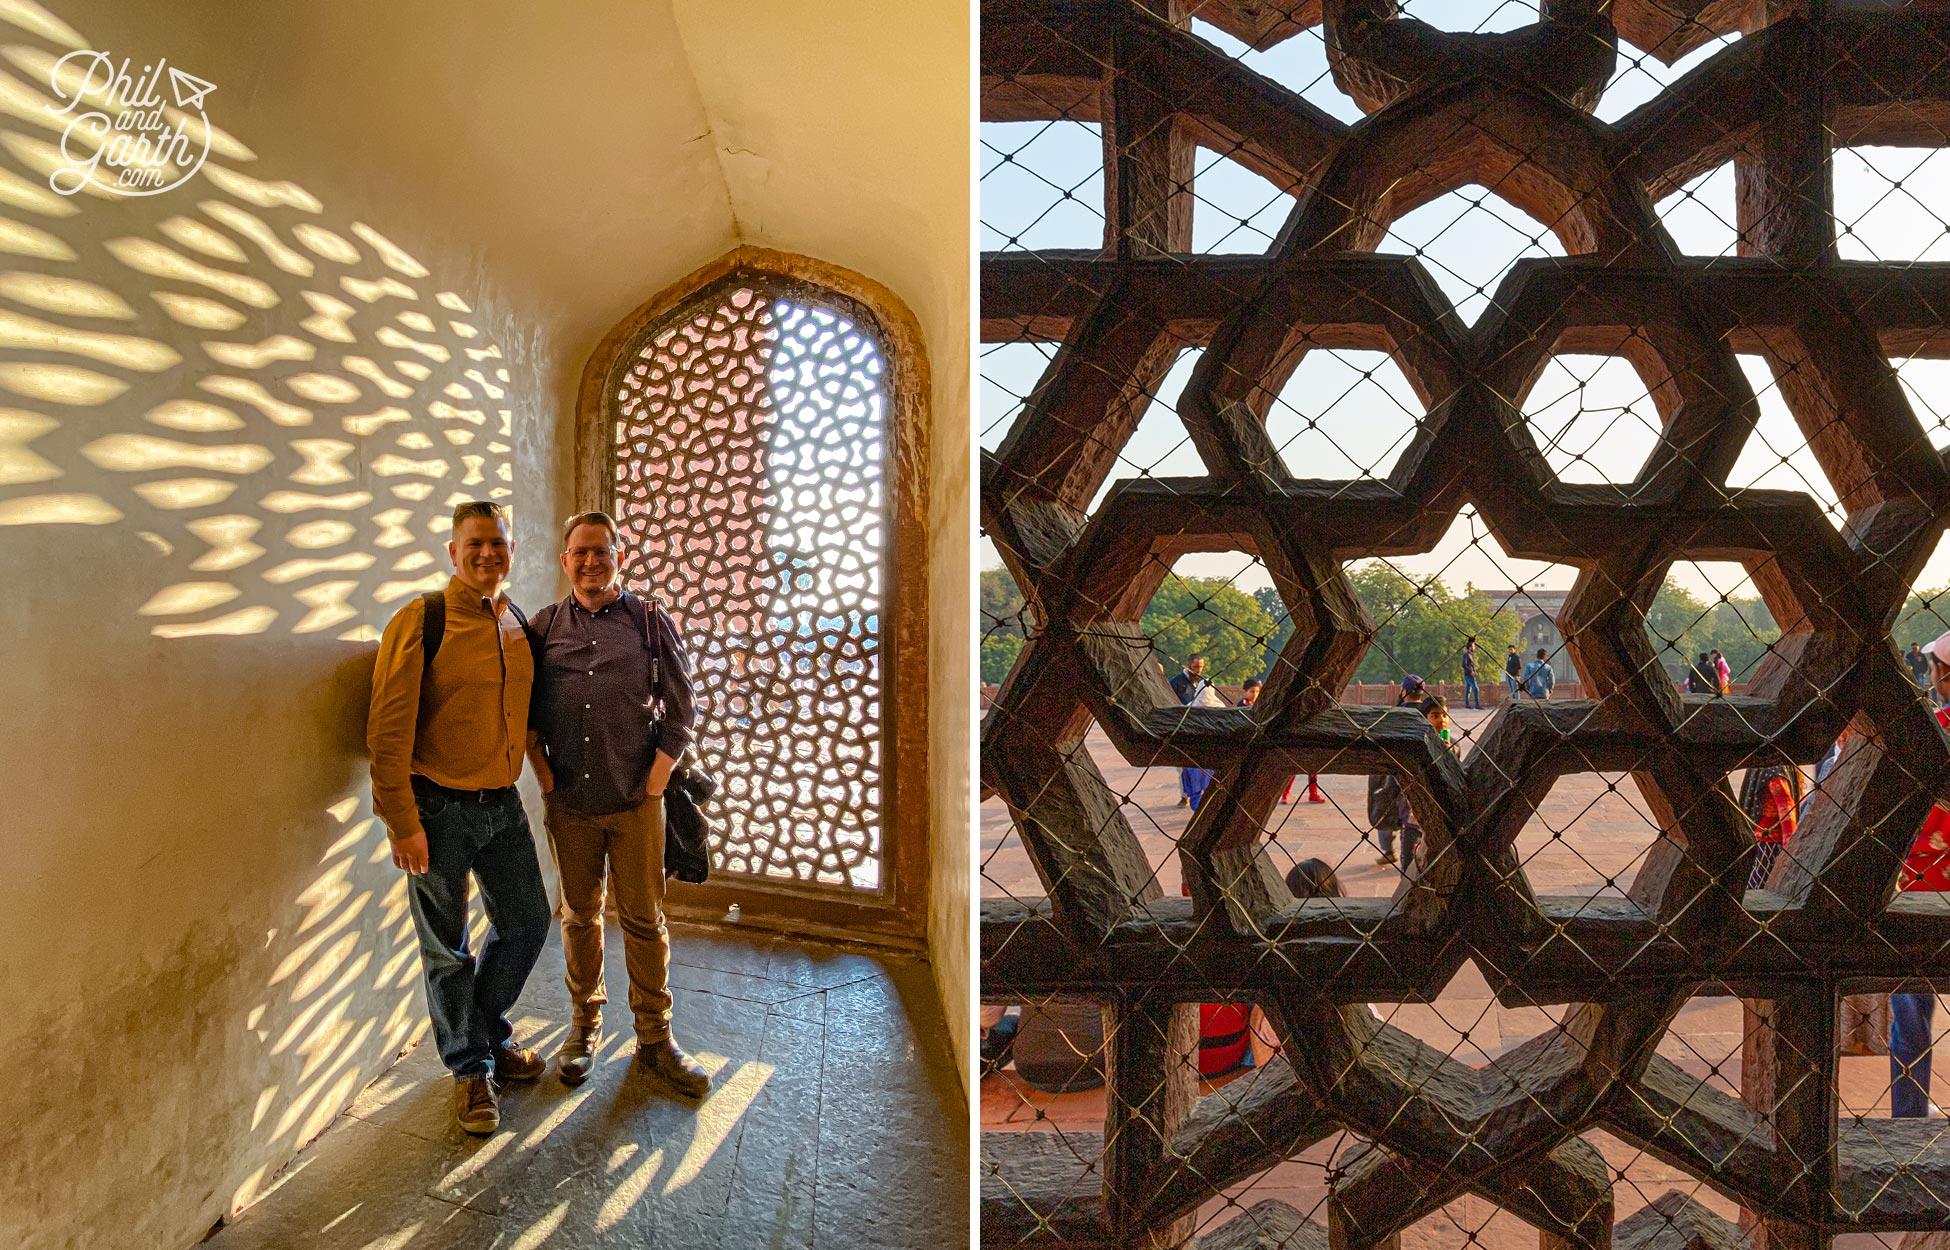 Fabulous low light shadows cast by a lattice stone window inside